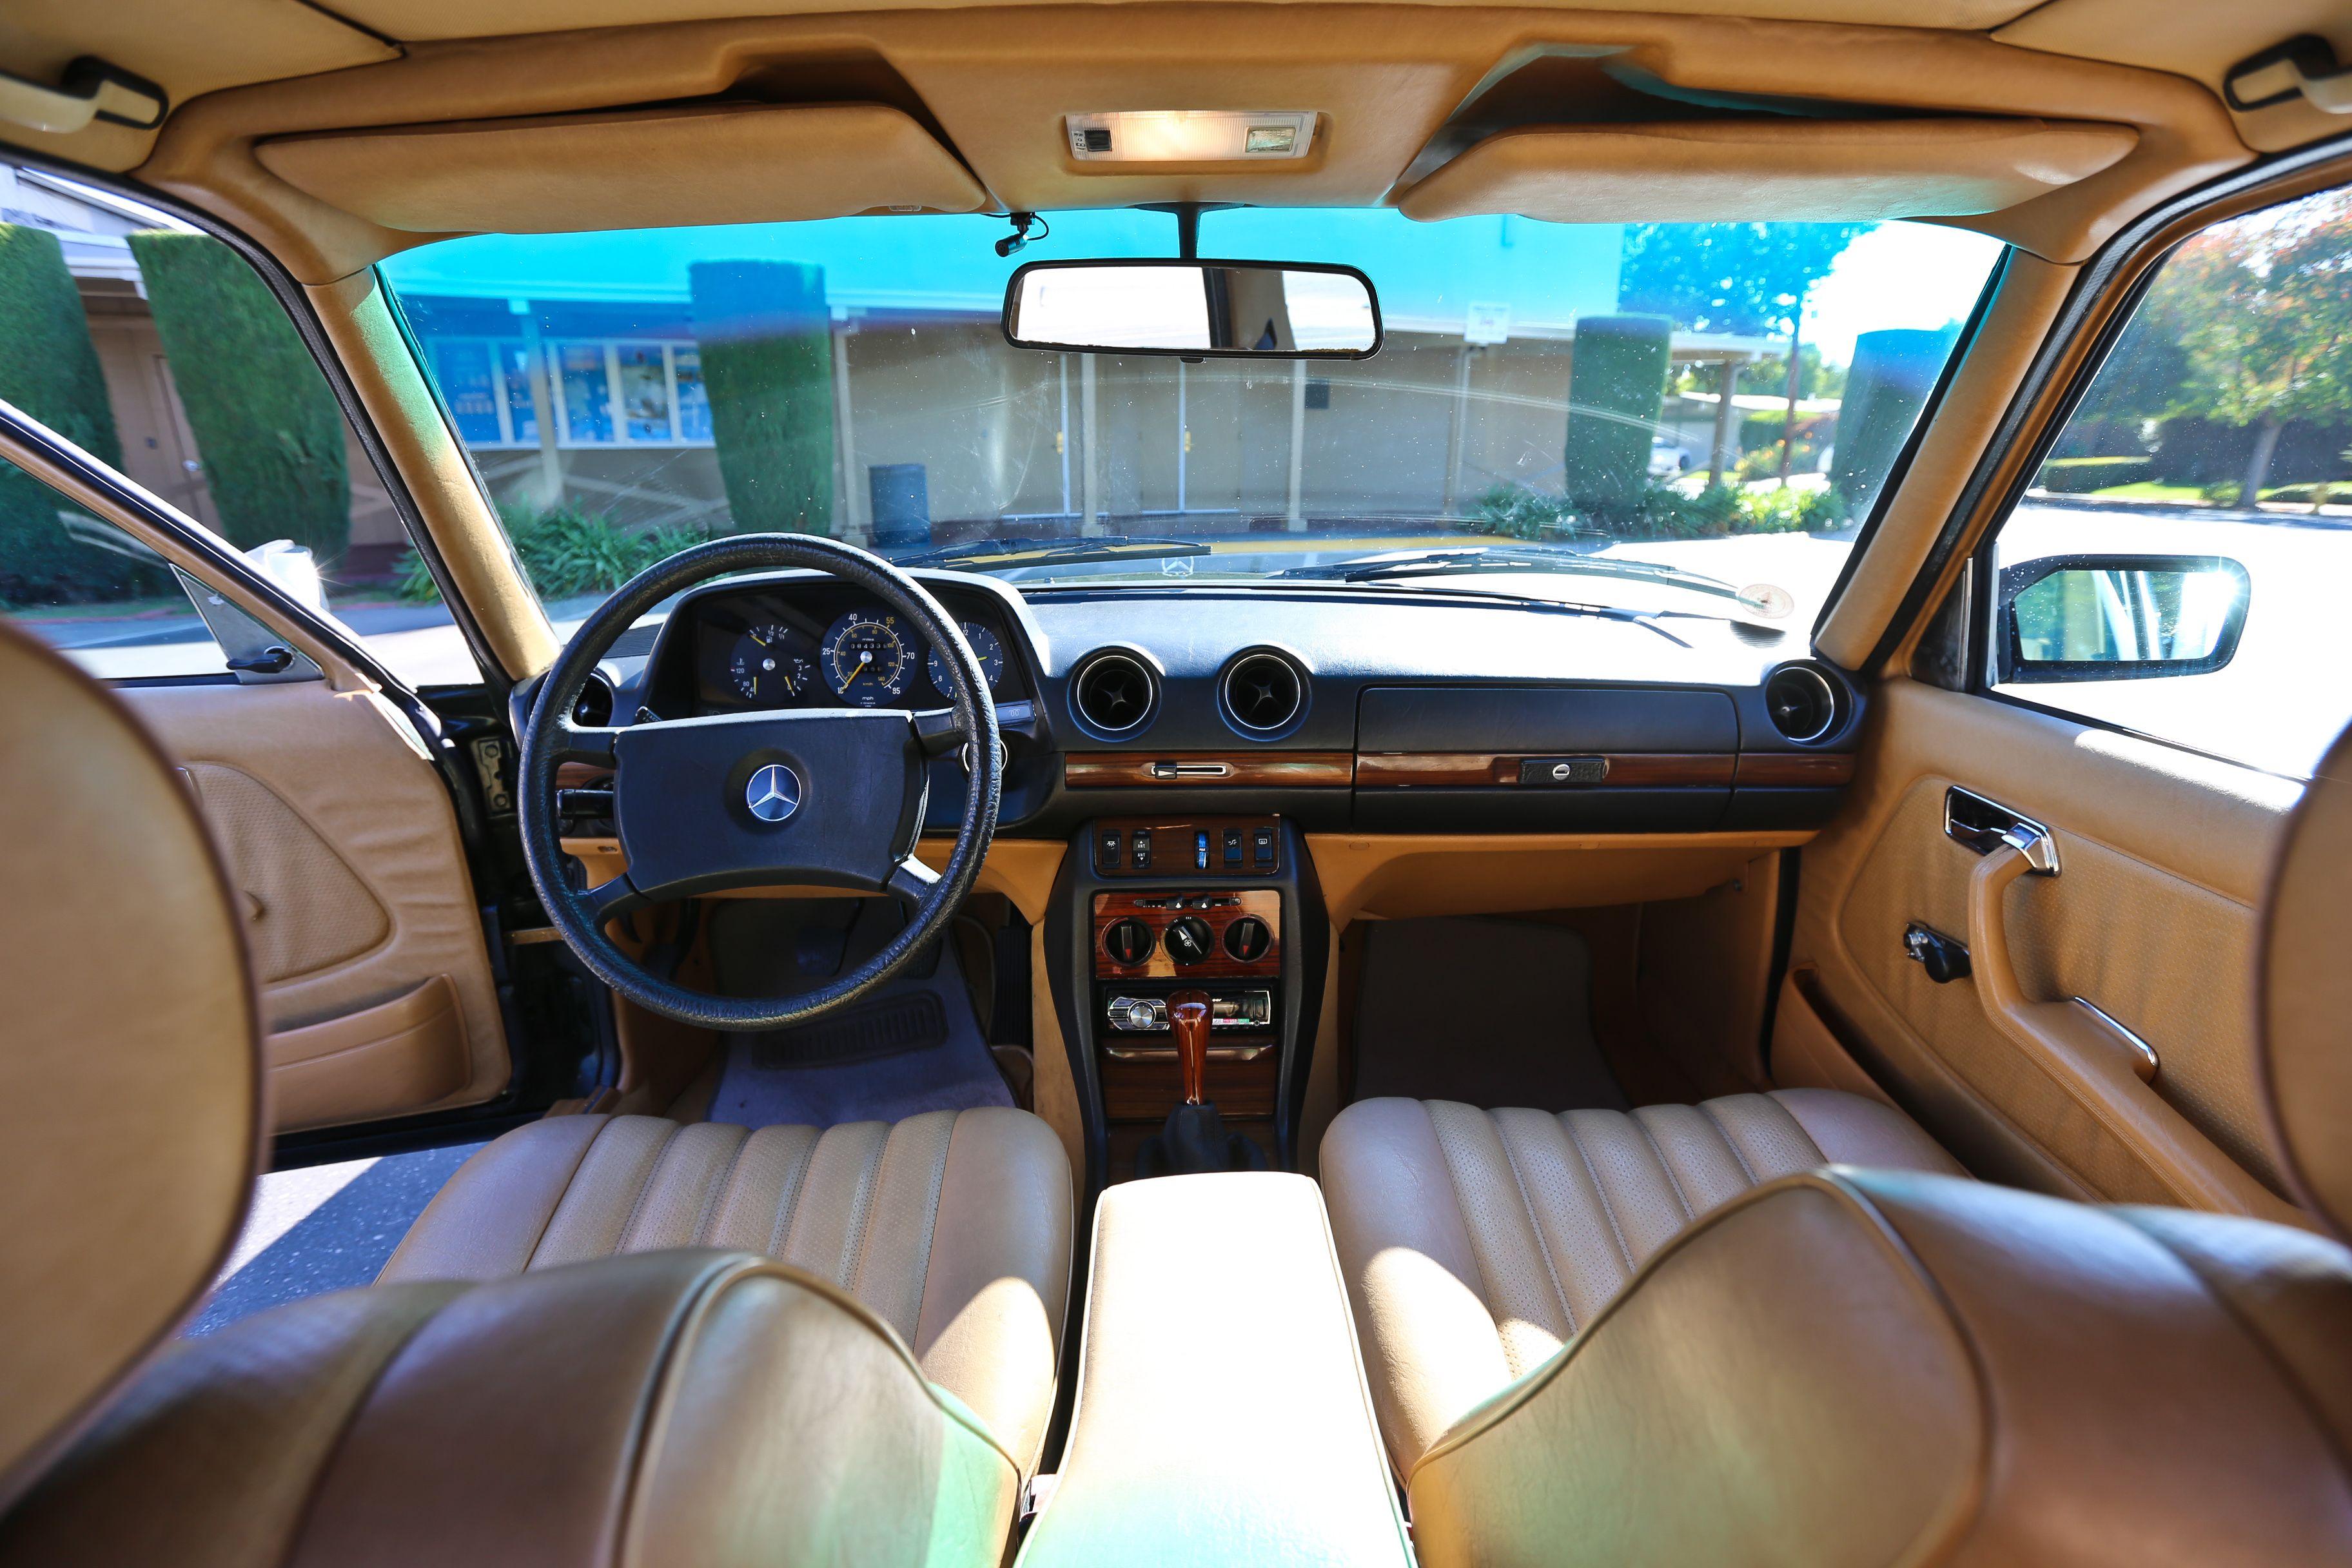 Image result for mercedes w123 interior | Voitures | Pinterest ...